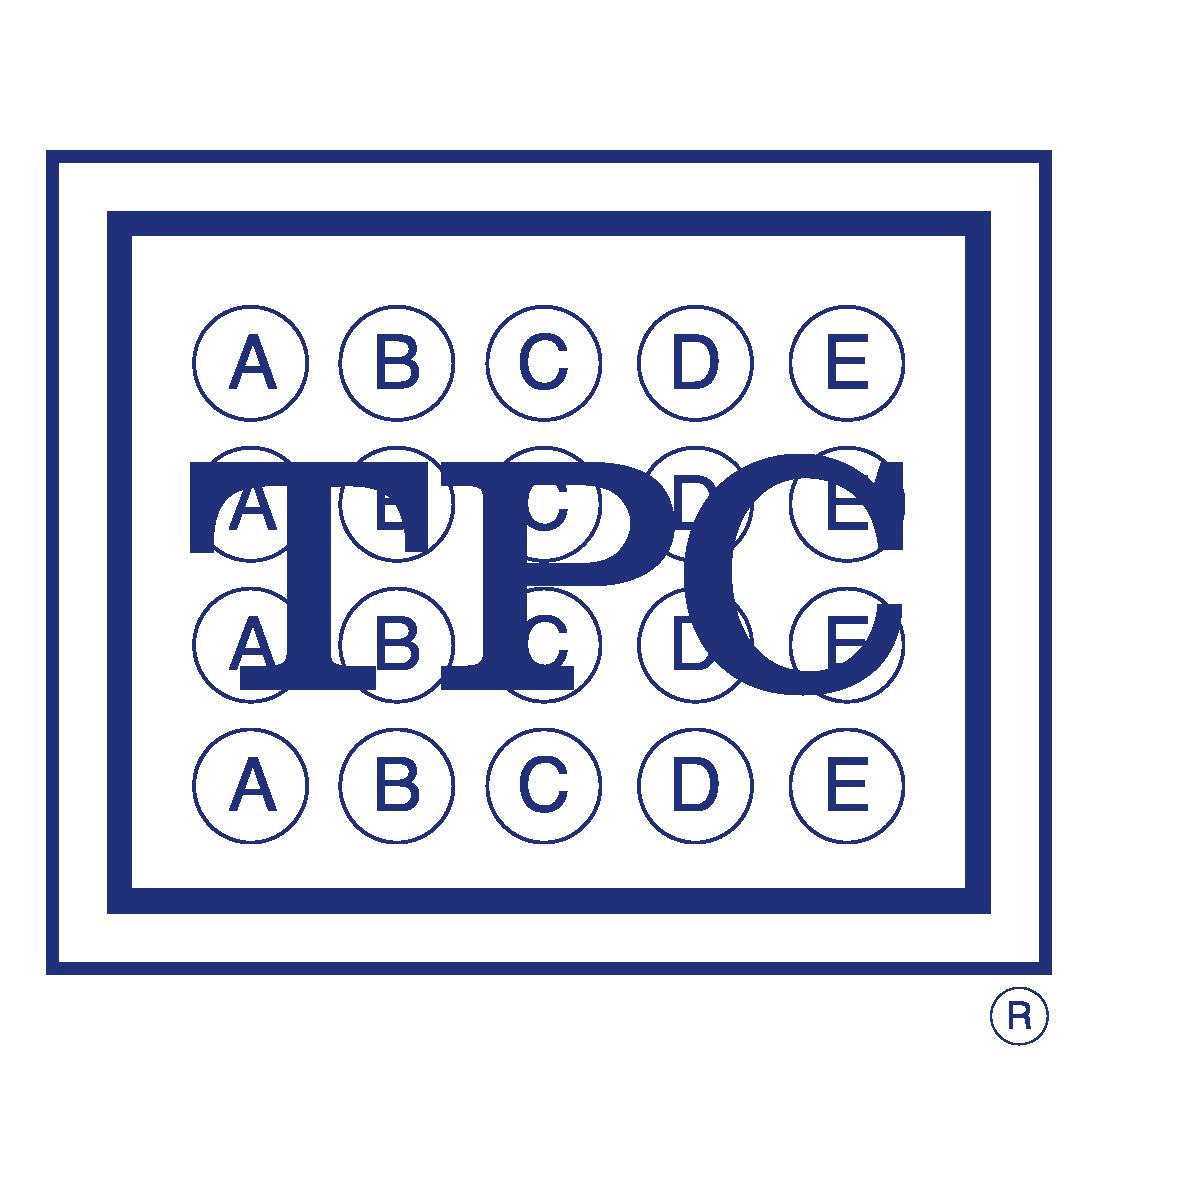 medium resolution of High School Entrance Exam Testing - Test Prep Chicago